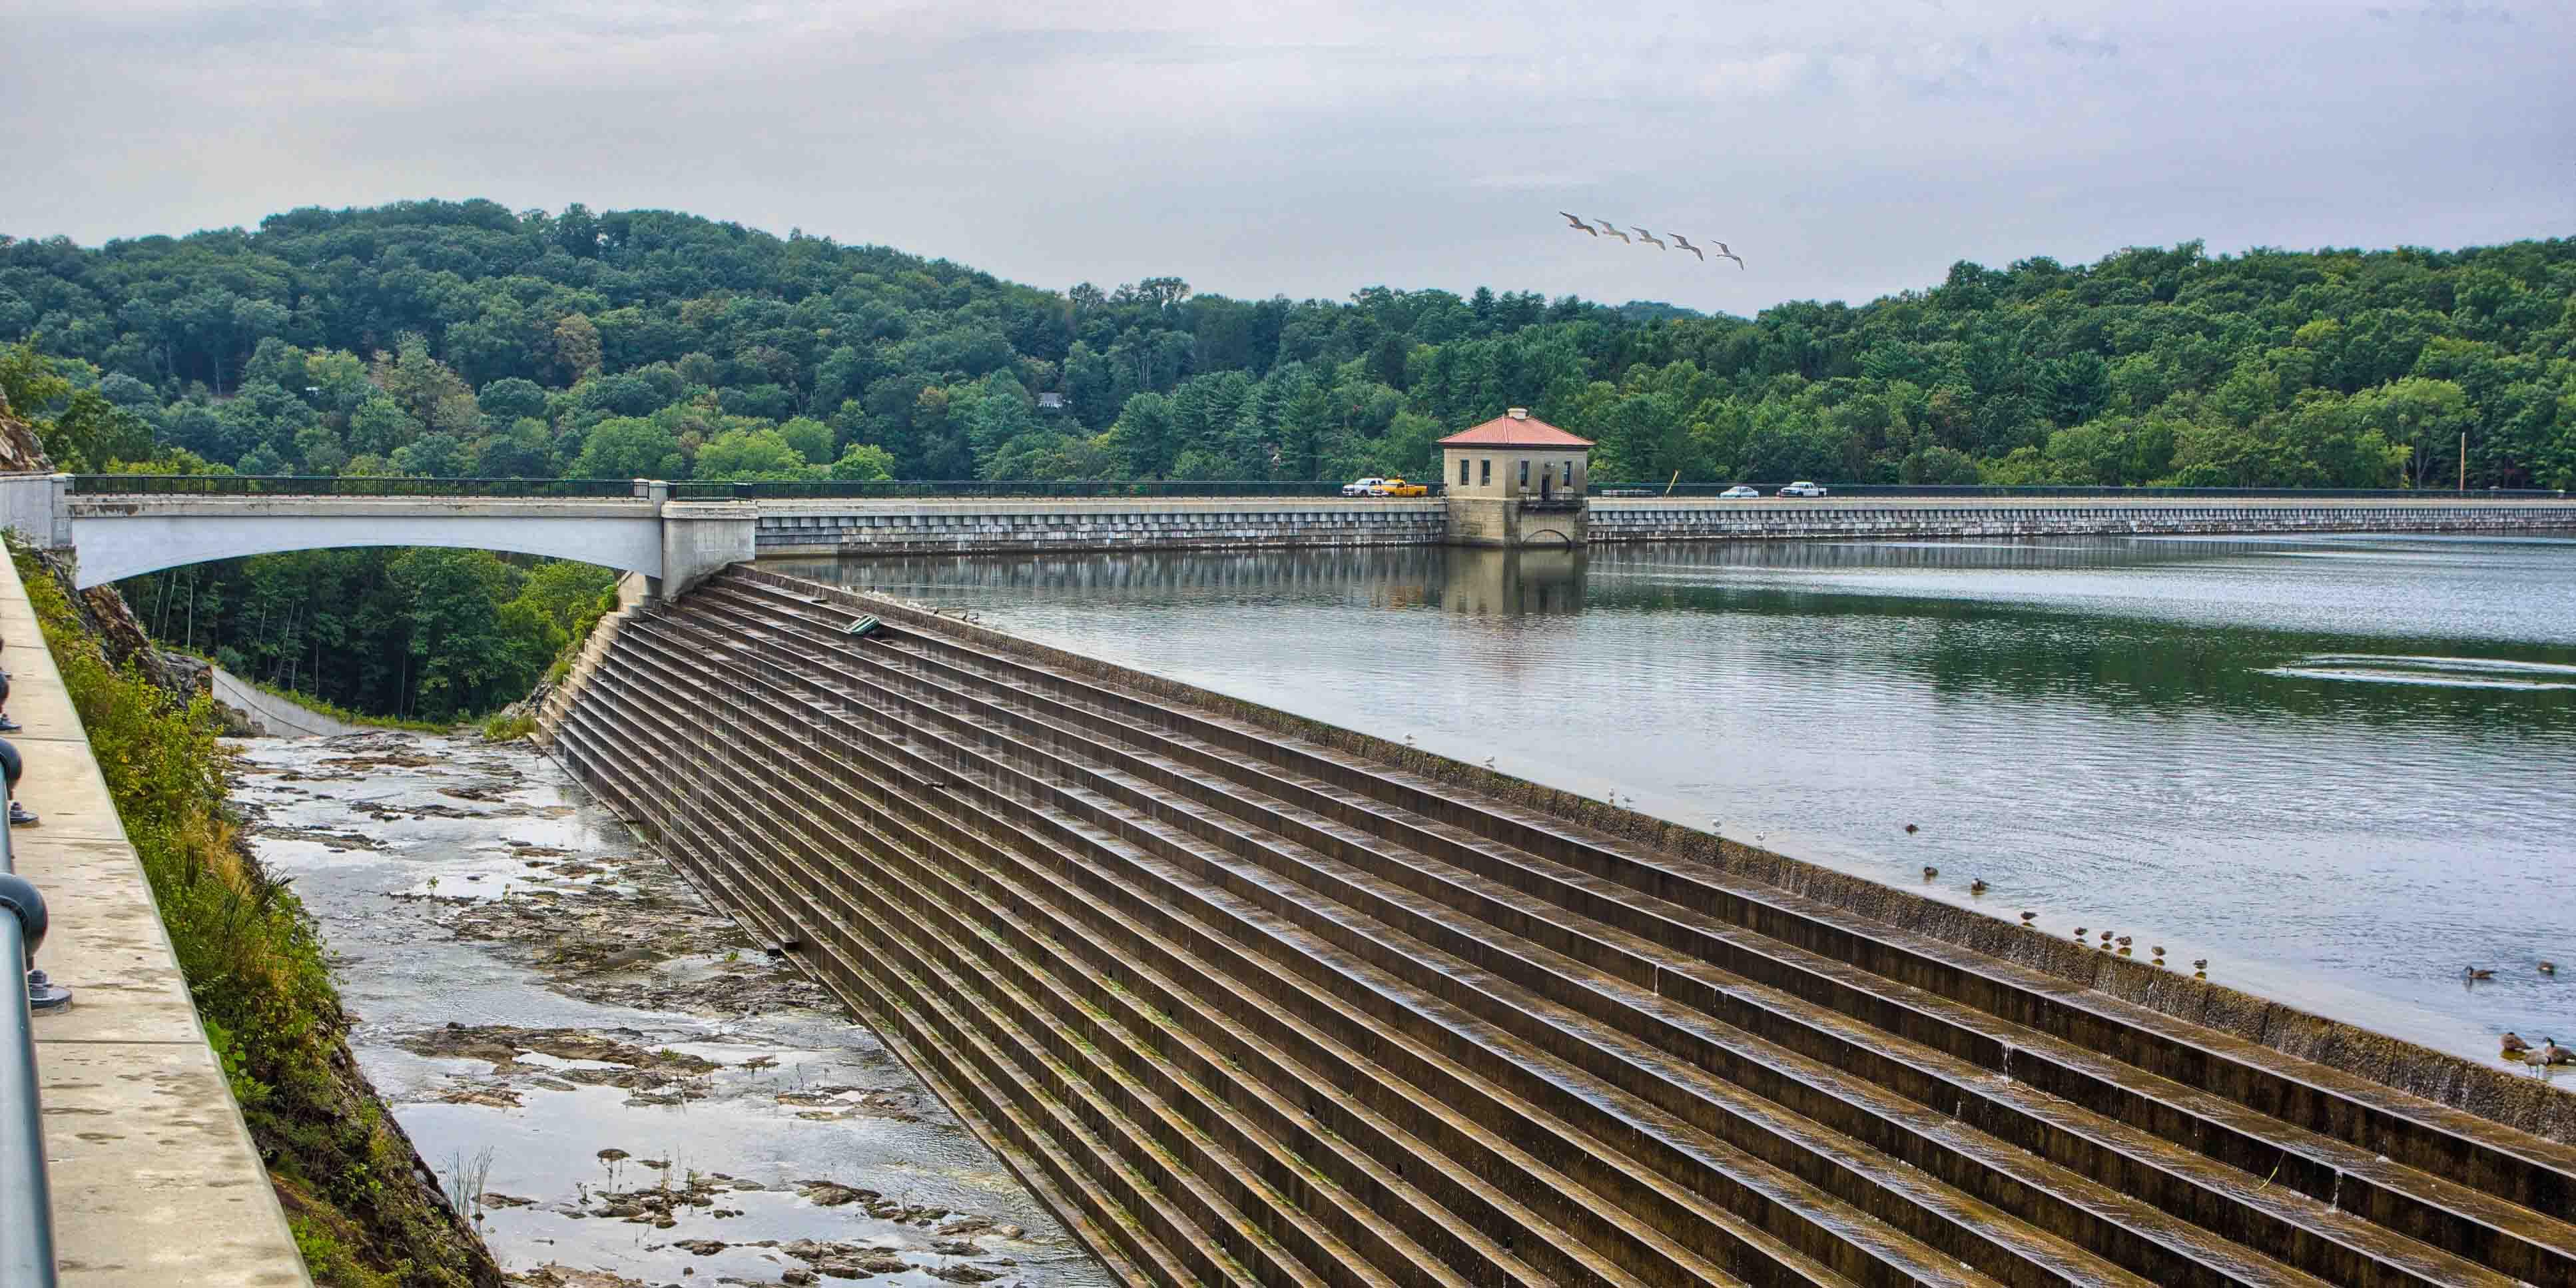 Brochure: Dams & Reservoirs